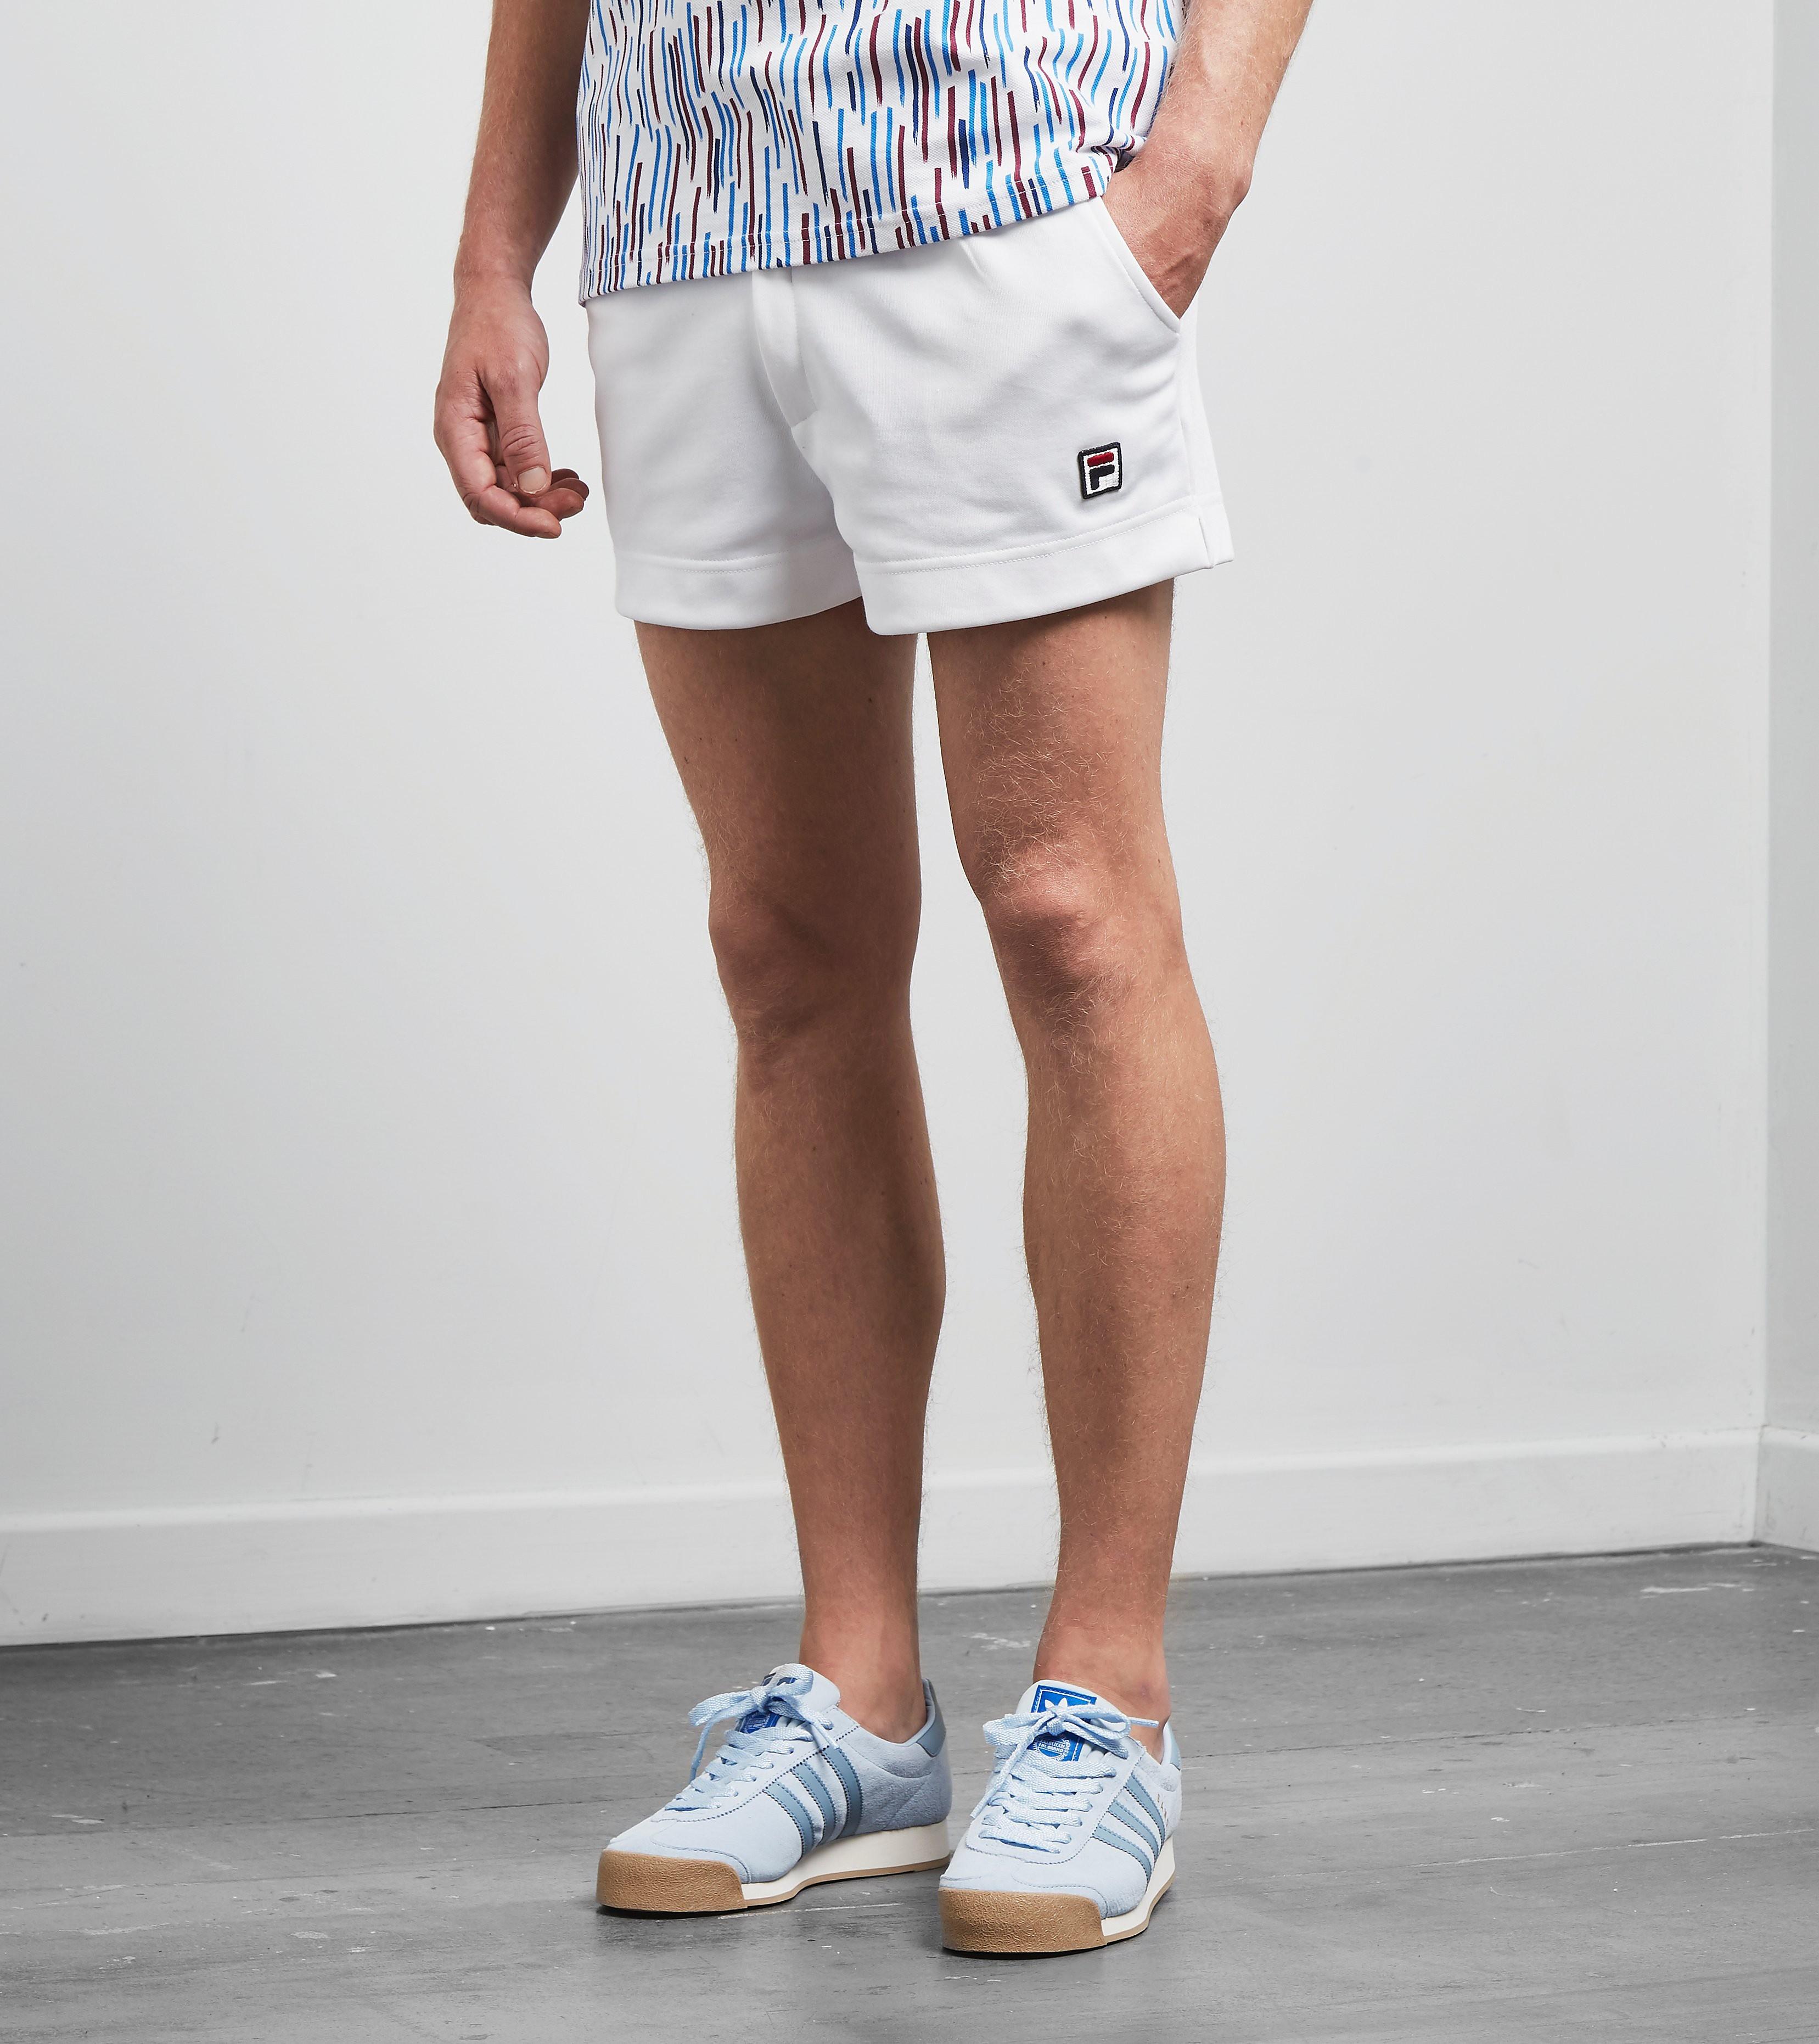 Fila Jolla Shorts - size? Exclusive